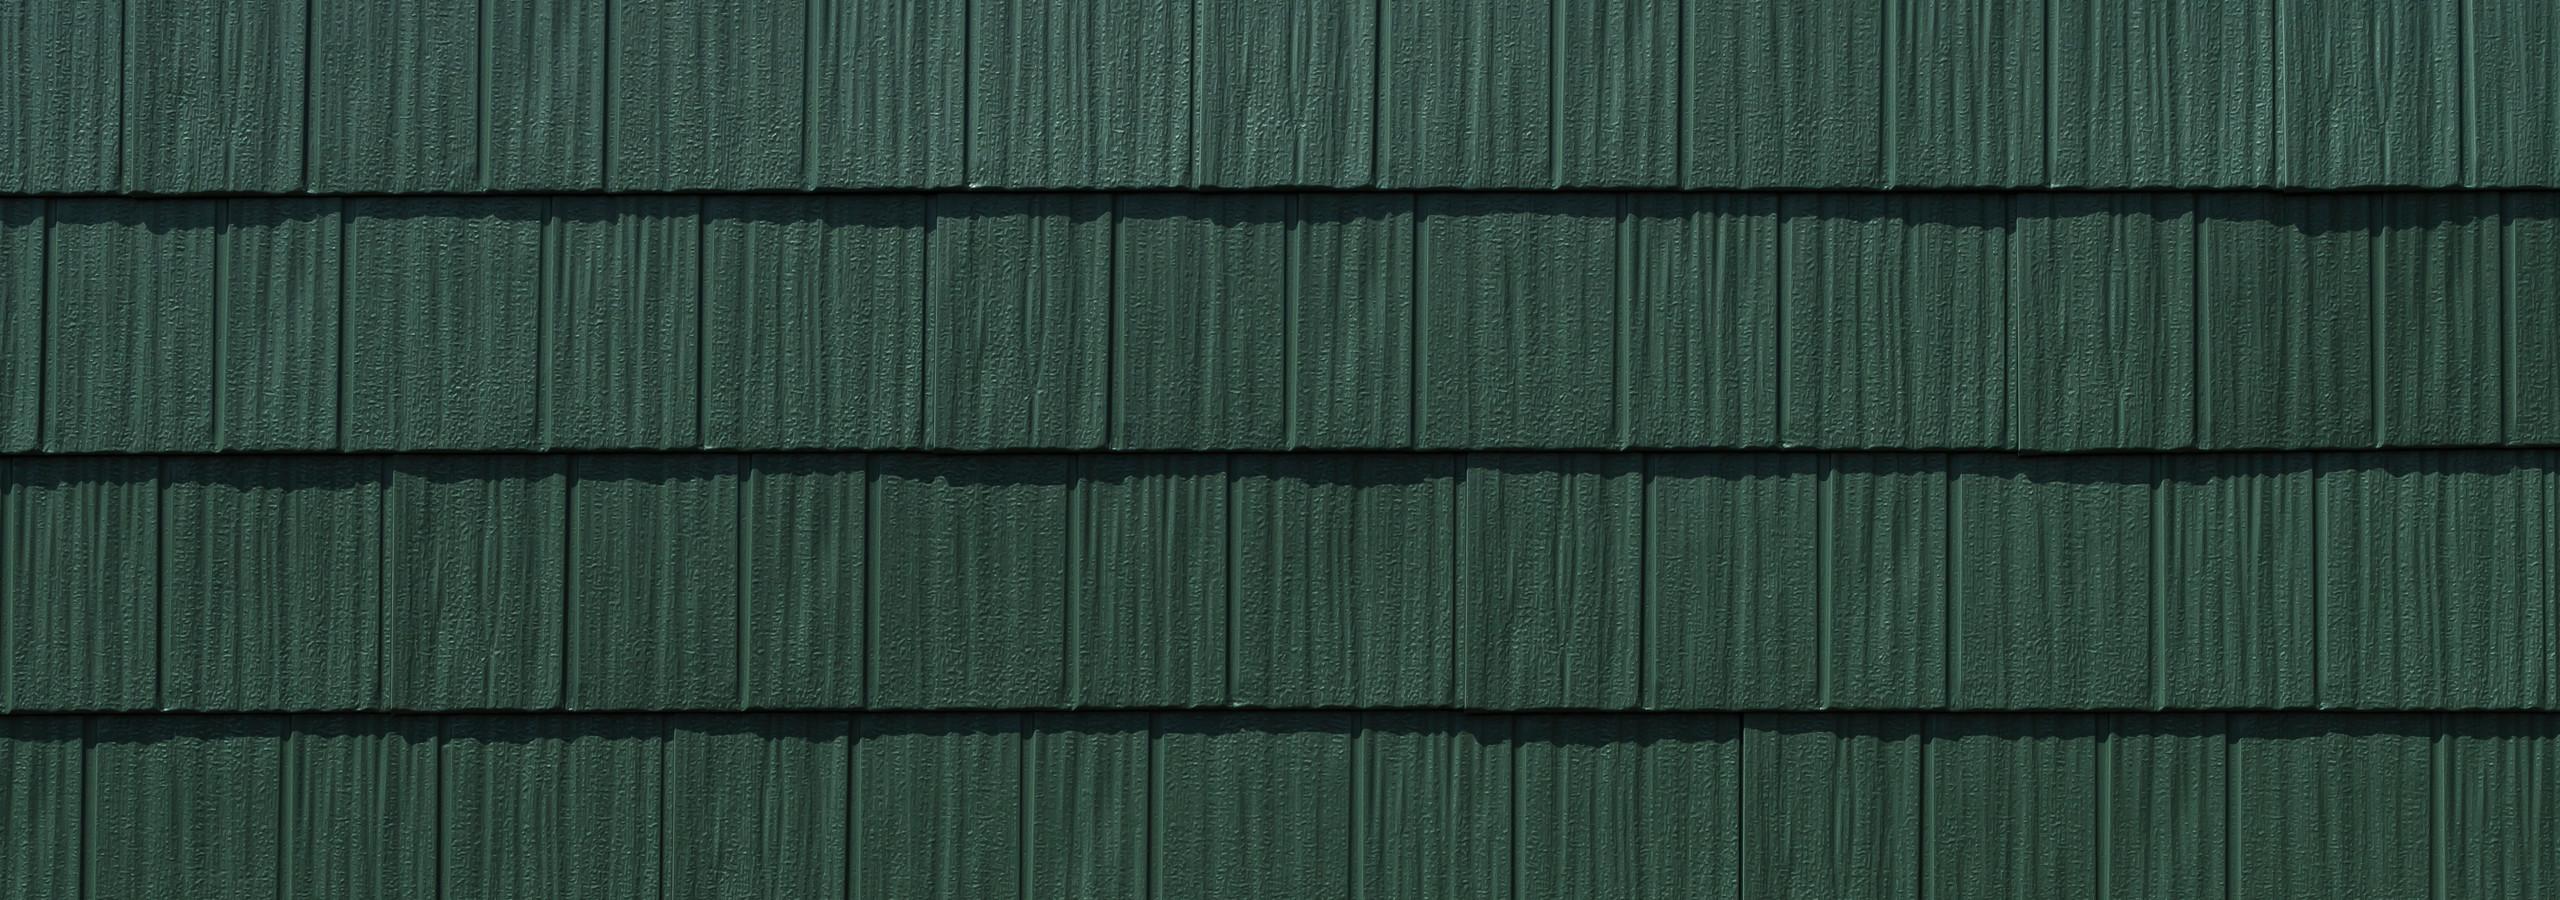 Arrowline shake hartford green steel siding